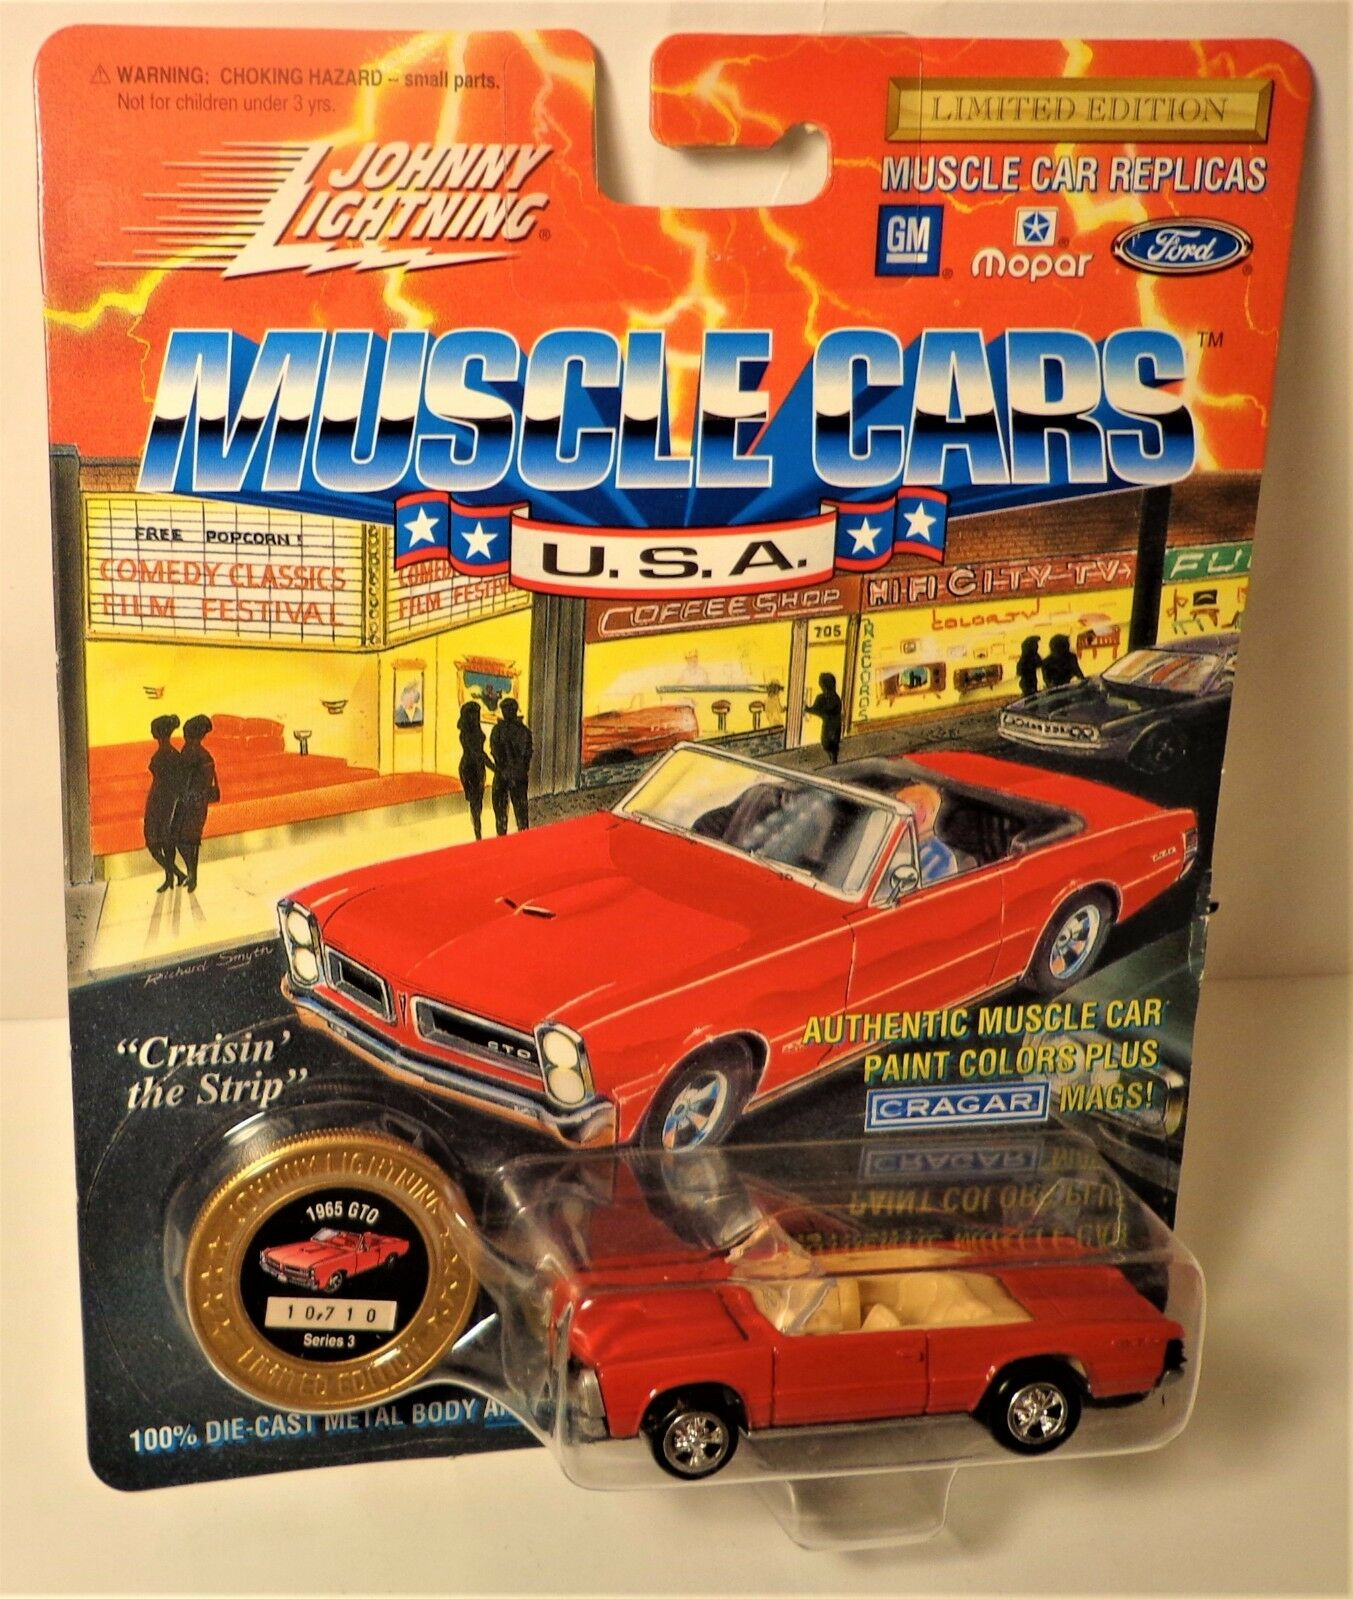 Johnny Lightning Muscle Cars USA 1965 GTO Le Series 3 | eBay